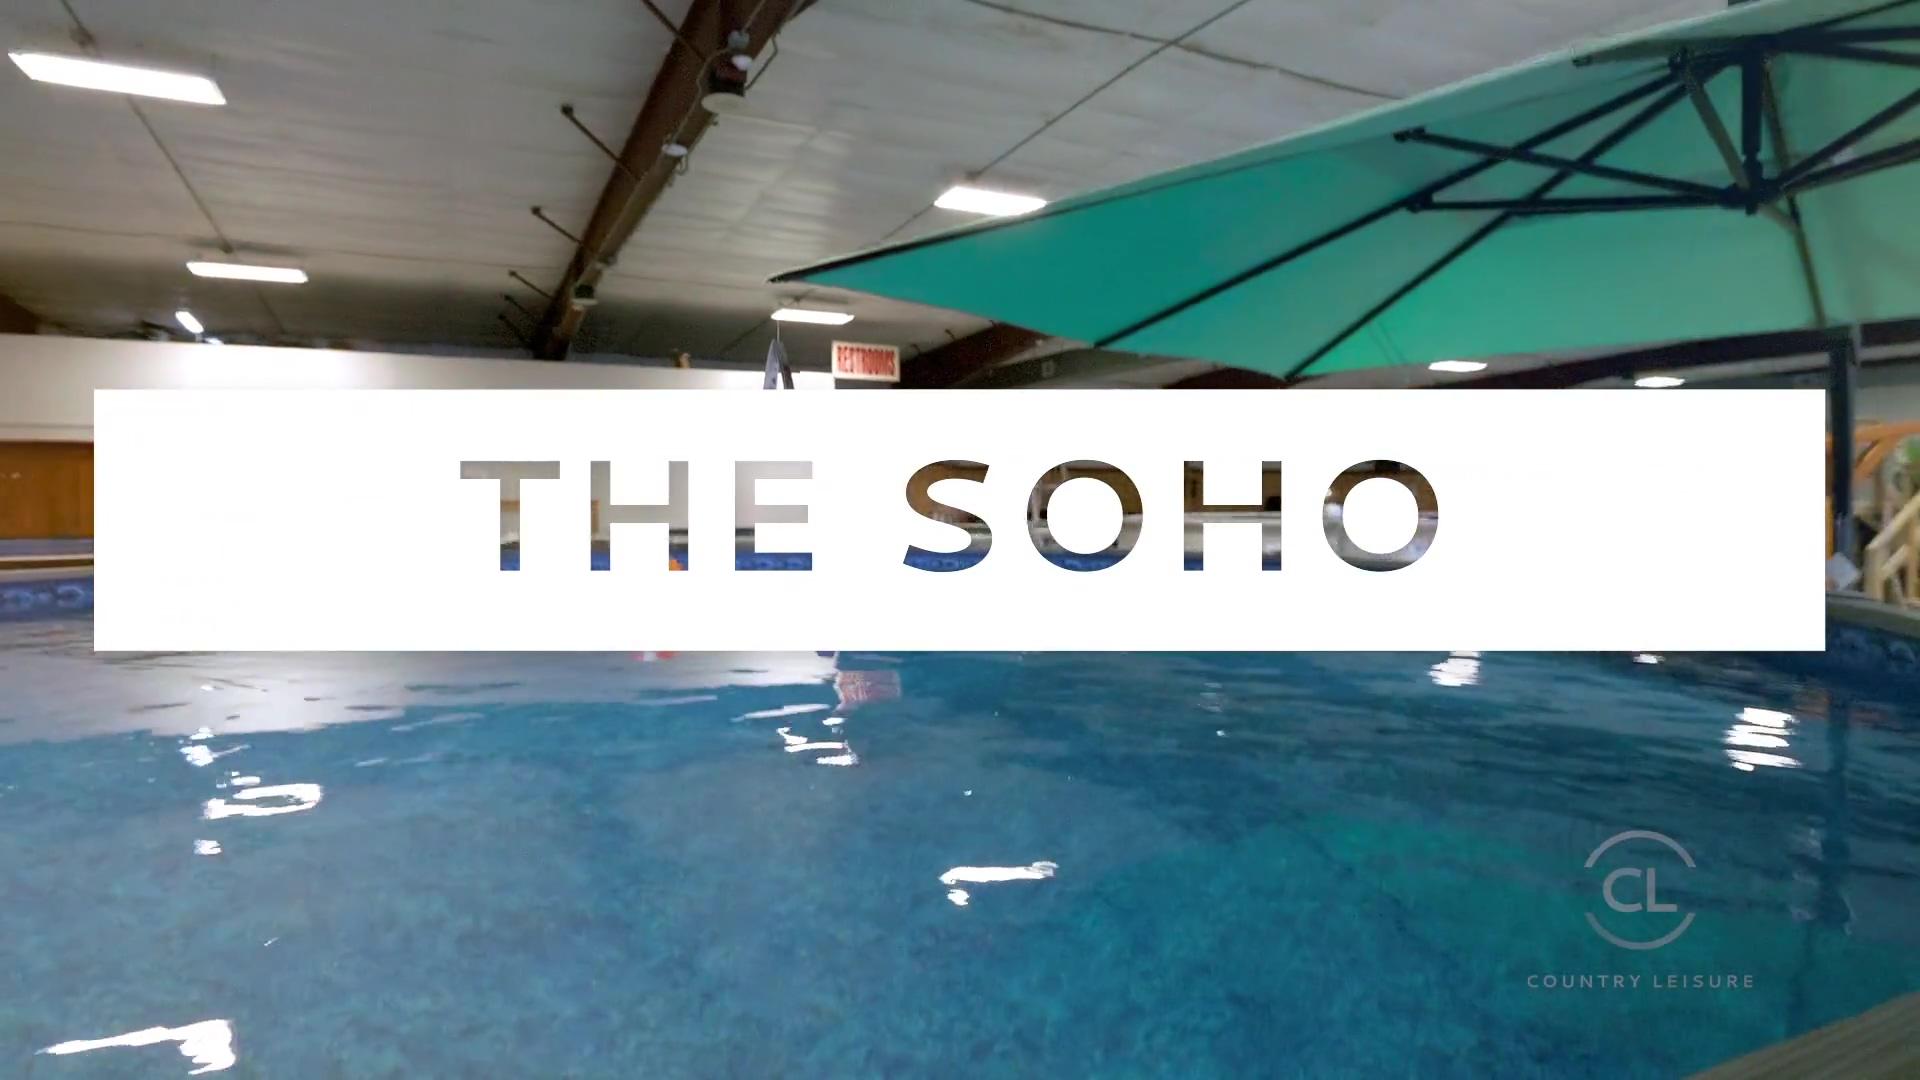 Soho Pool  Country Leisure 2019 v5